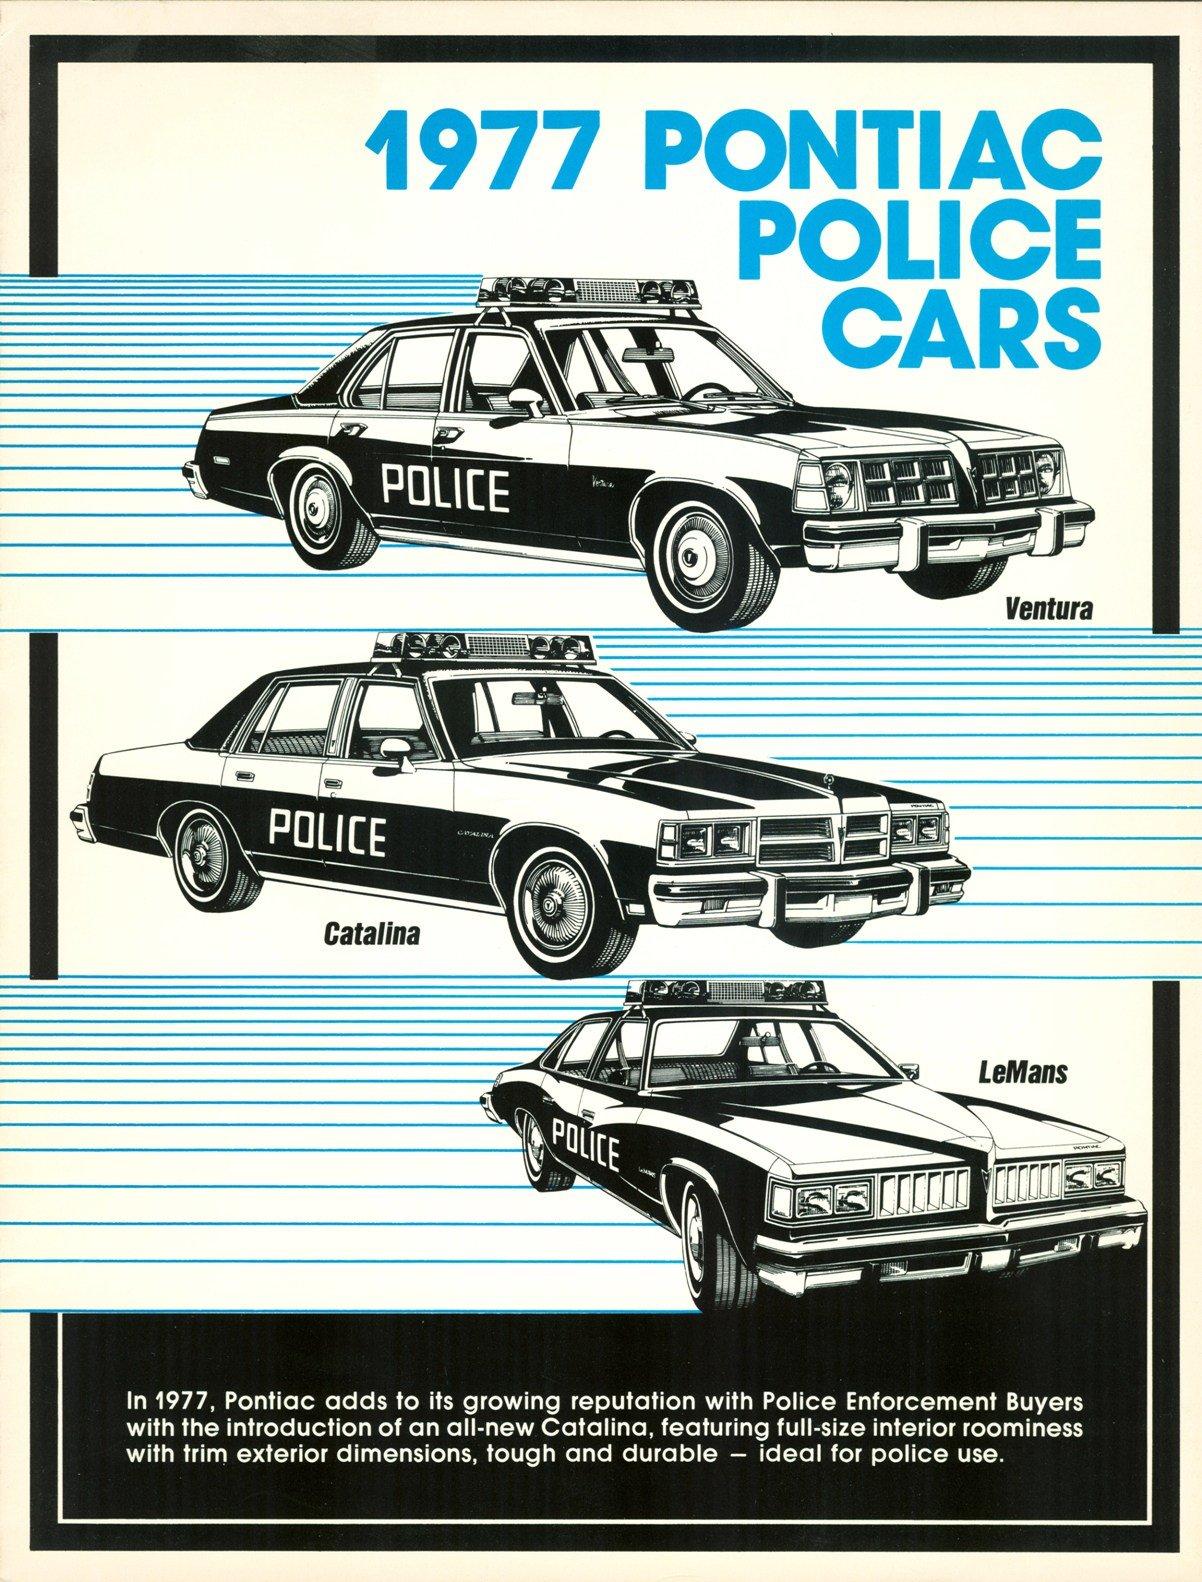 1977 Pontiac Police Cars